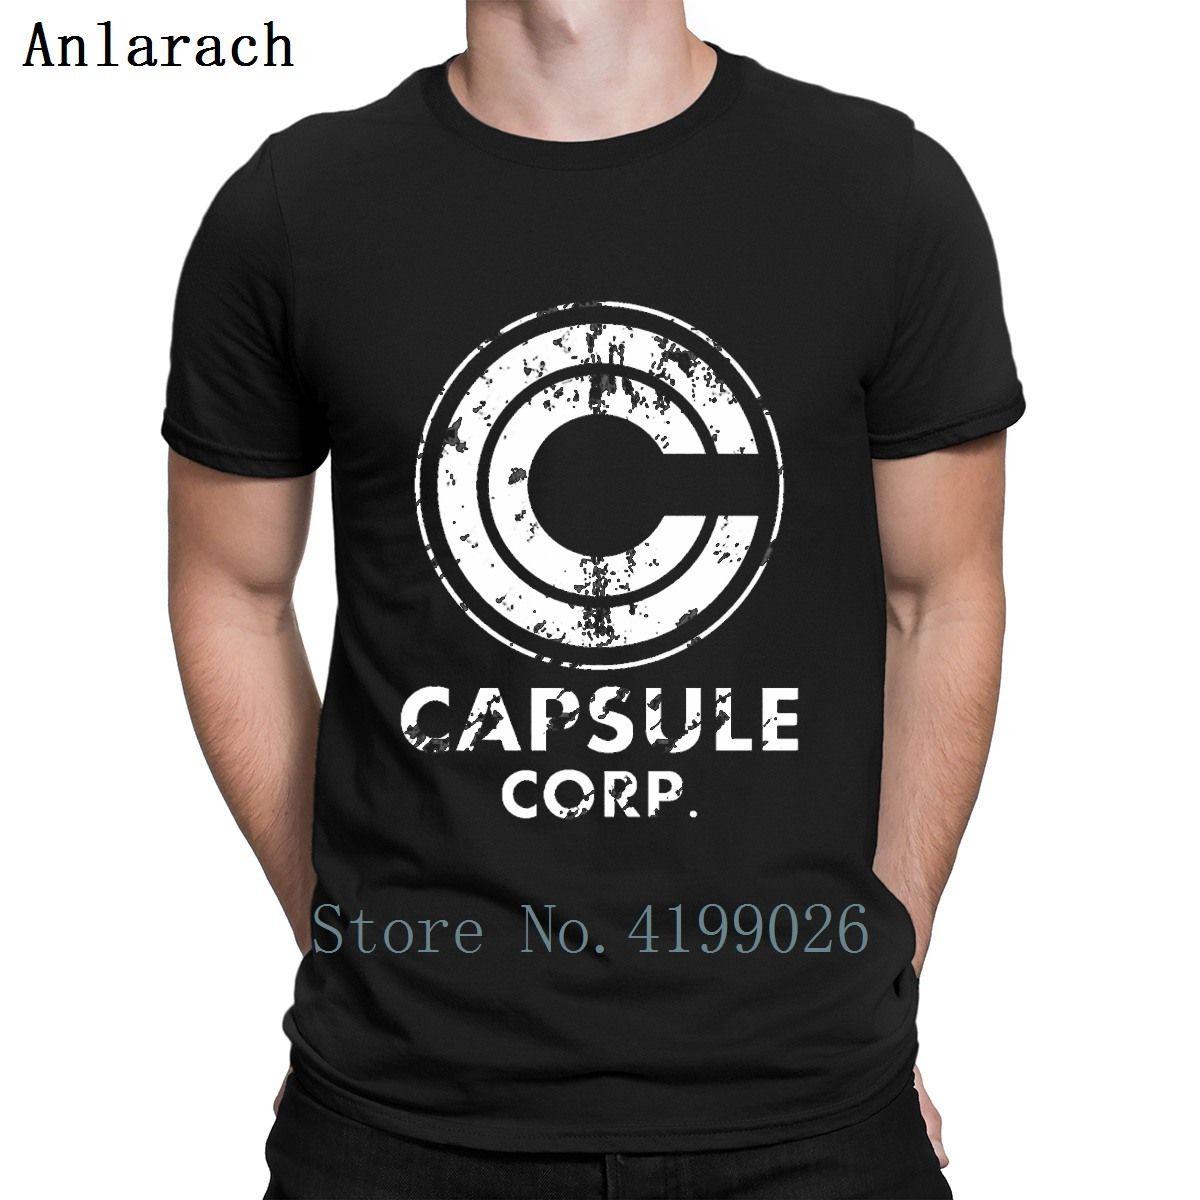 Capsule Corp Vegeta Goku T Shirt Quirky Personalizzato Cotton Semplici Gents Mens Streetwear Camicia La nuova Kawaii Style Summer Style